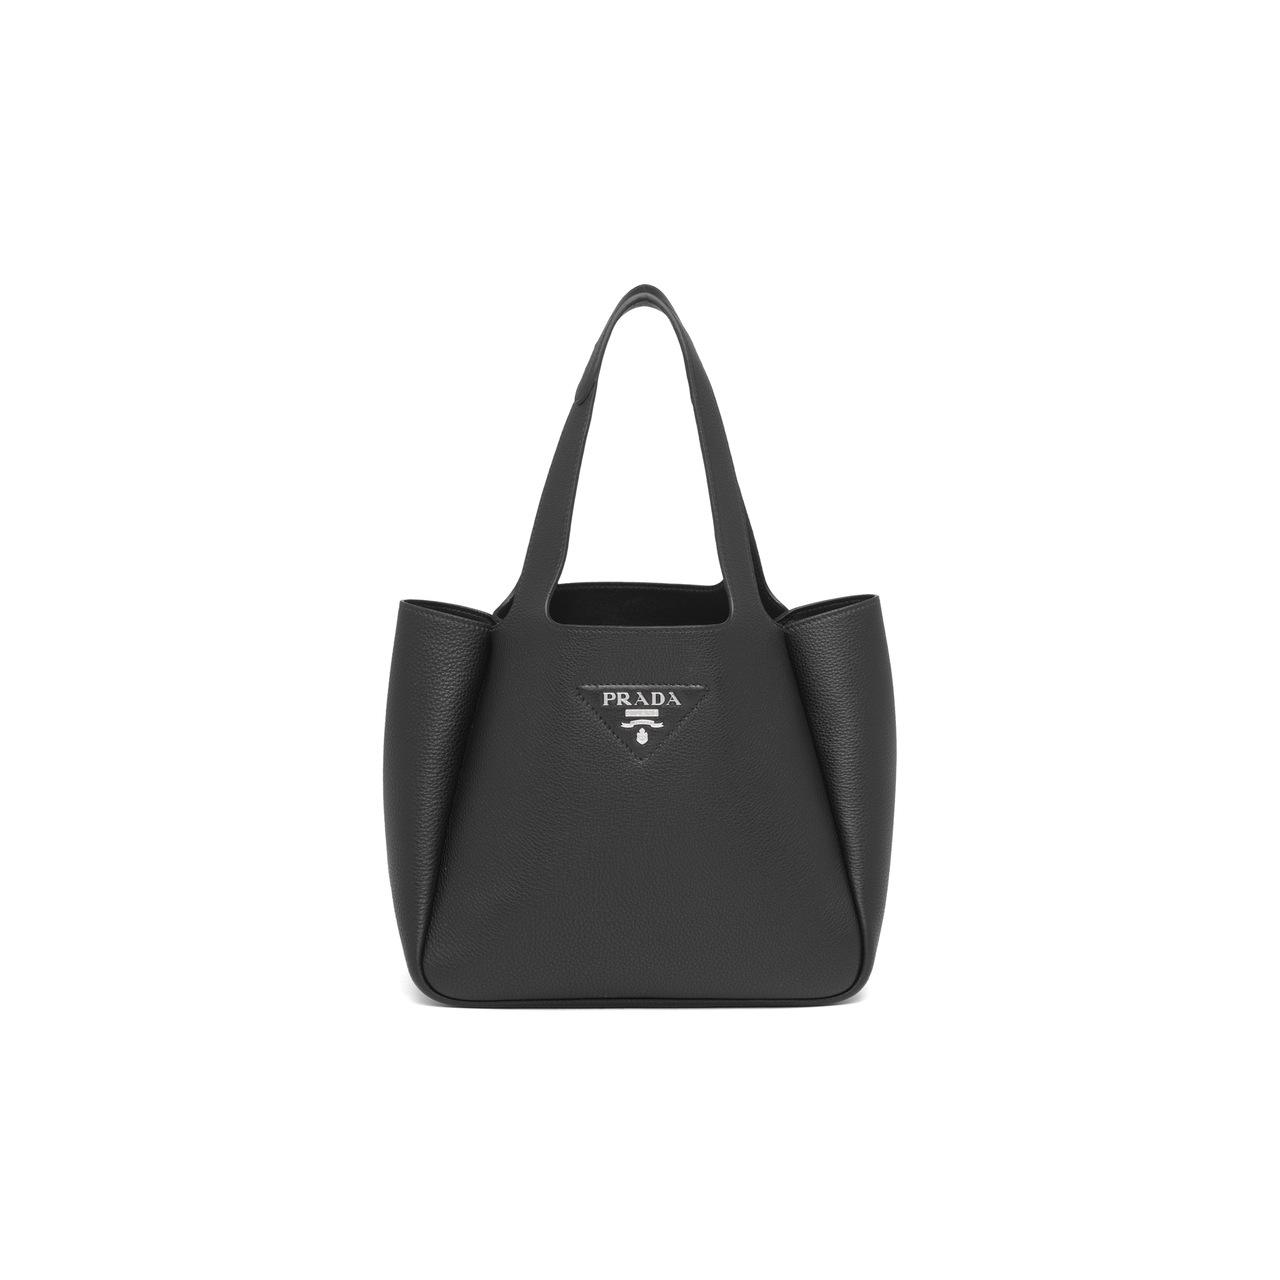 Prada Leather handbag 1